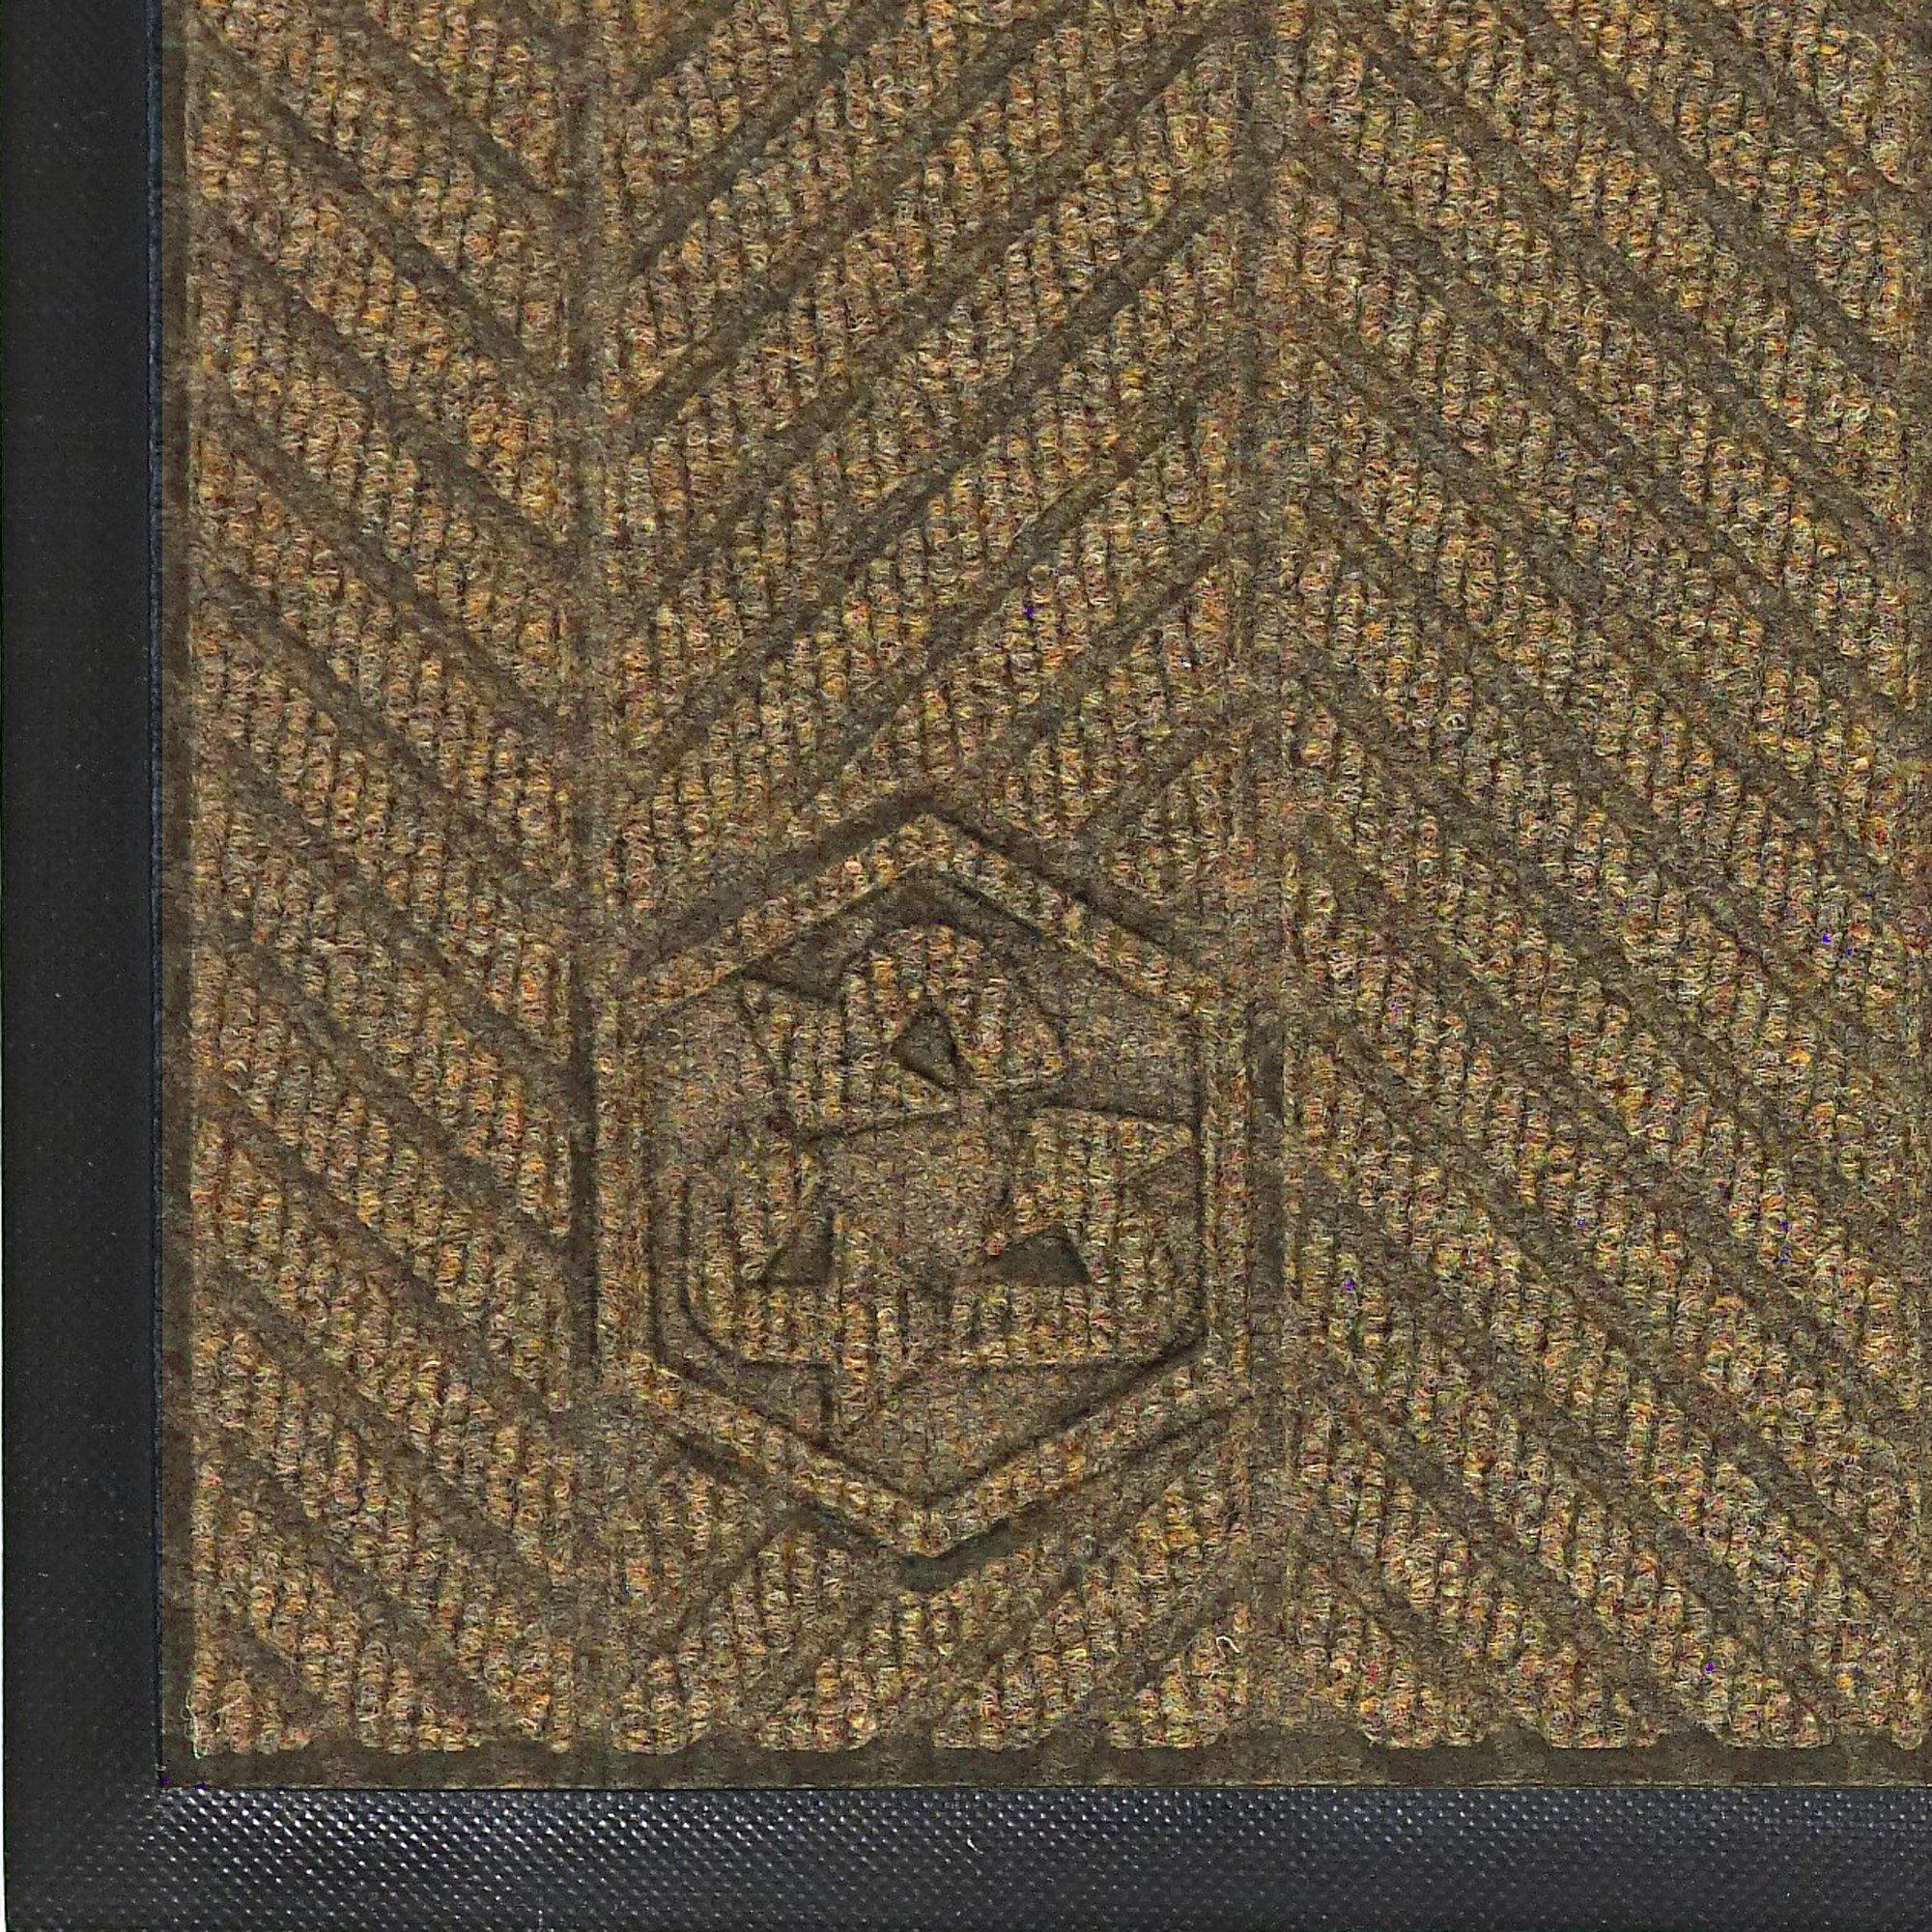 Andersen 2240 Waterhog Classic ECO Elite PET Polyester Entrance Indoor Floor Mat, SBR Rubber Backing, 6' Length x 4' Width, 3/8'' Thick, Khaki